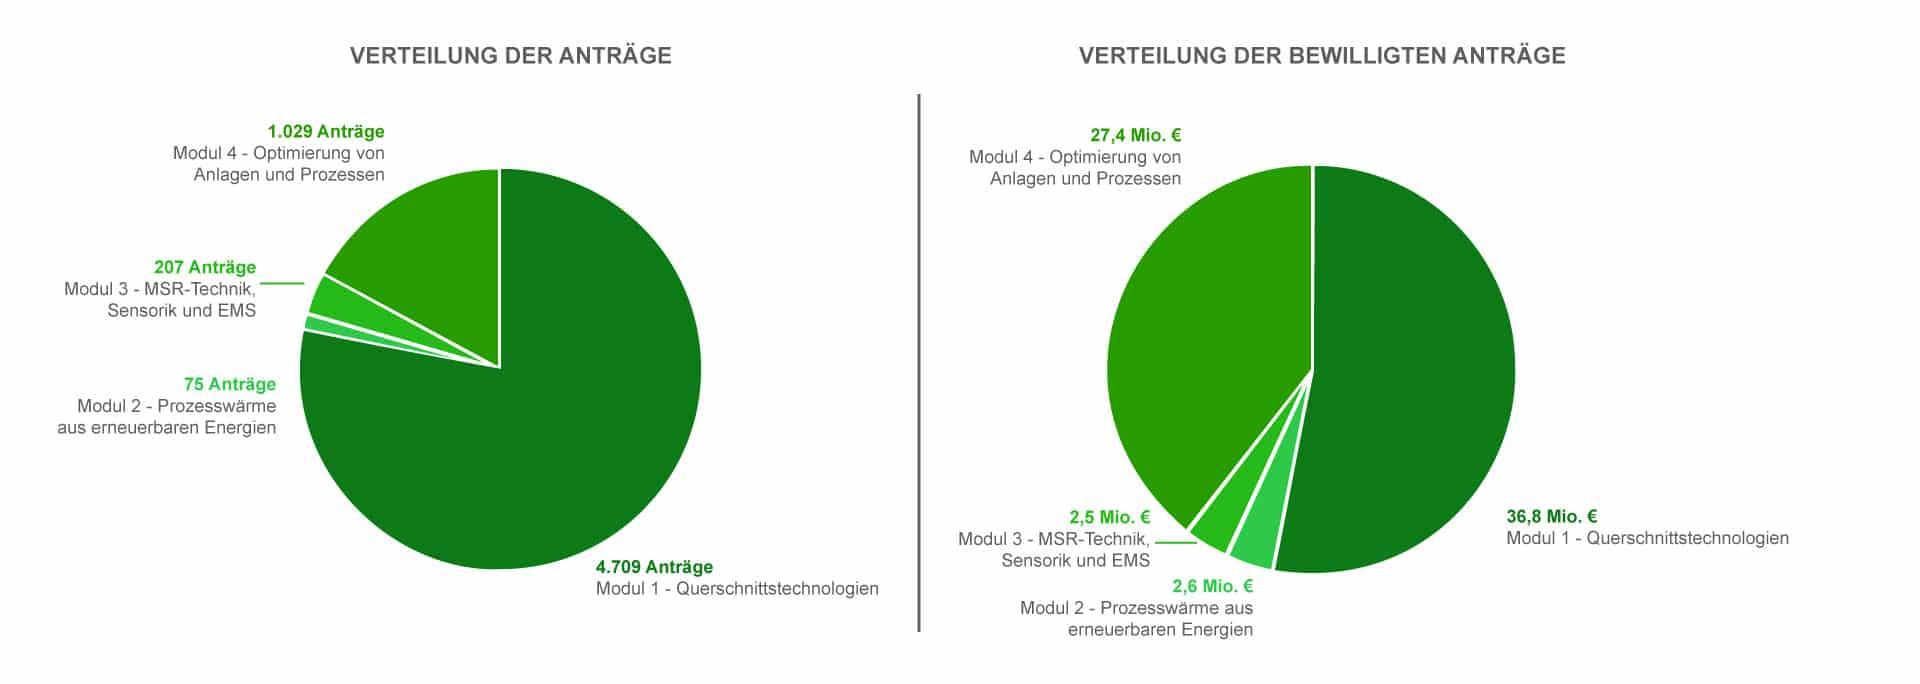 Quelle BAFA Präsentation zum BAFA Energietag